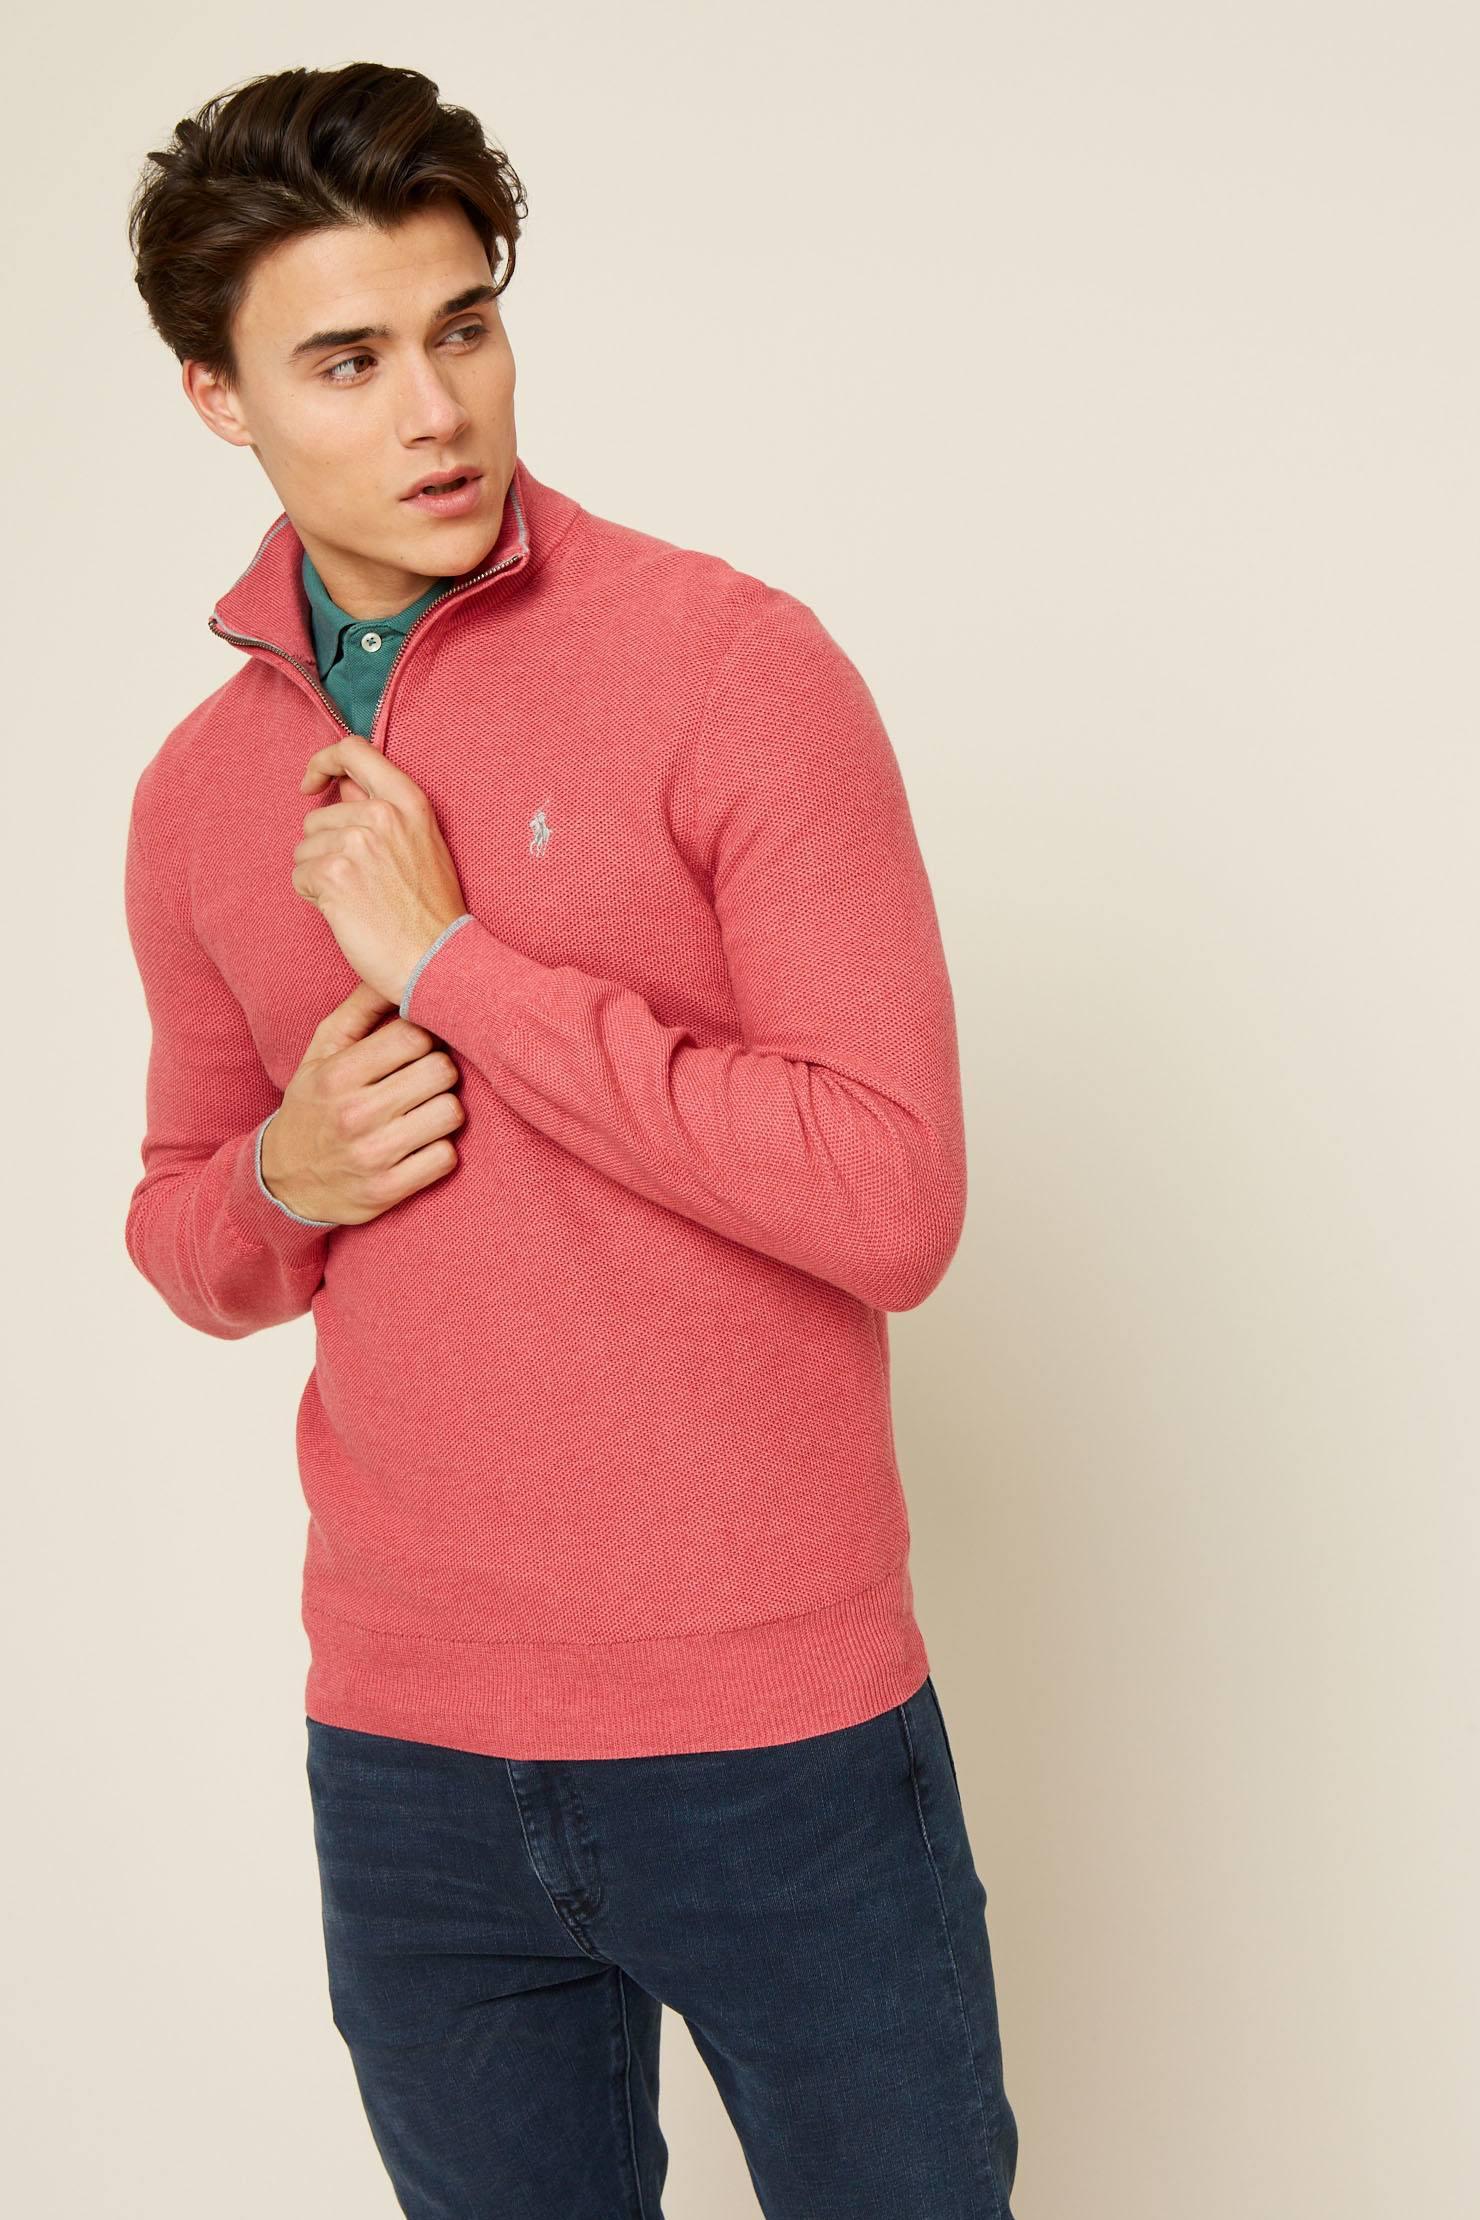 4e1612fd ... spain polo ralph lauren. mens pink sweater cardigan 150e9 5f5e3